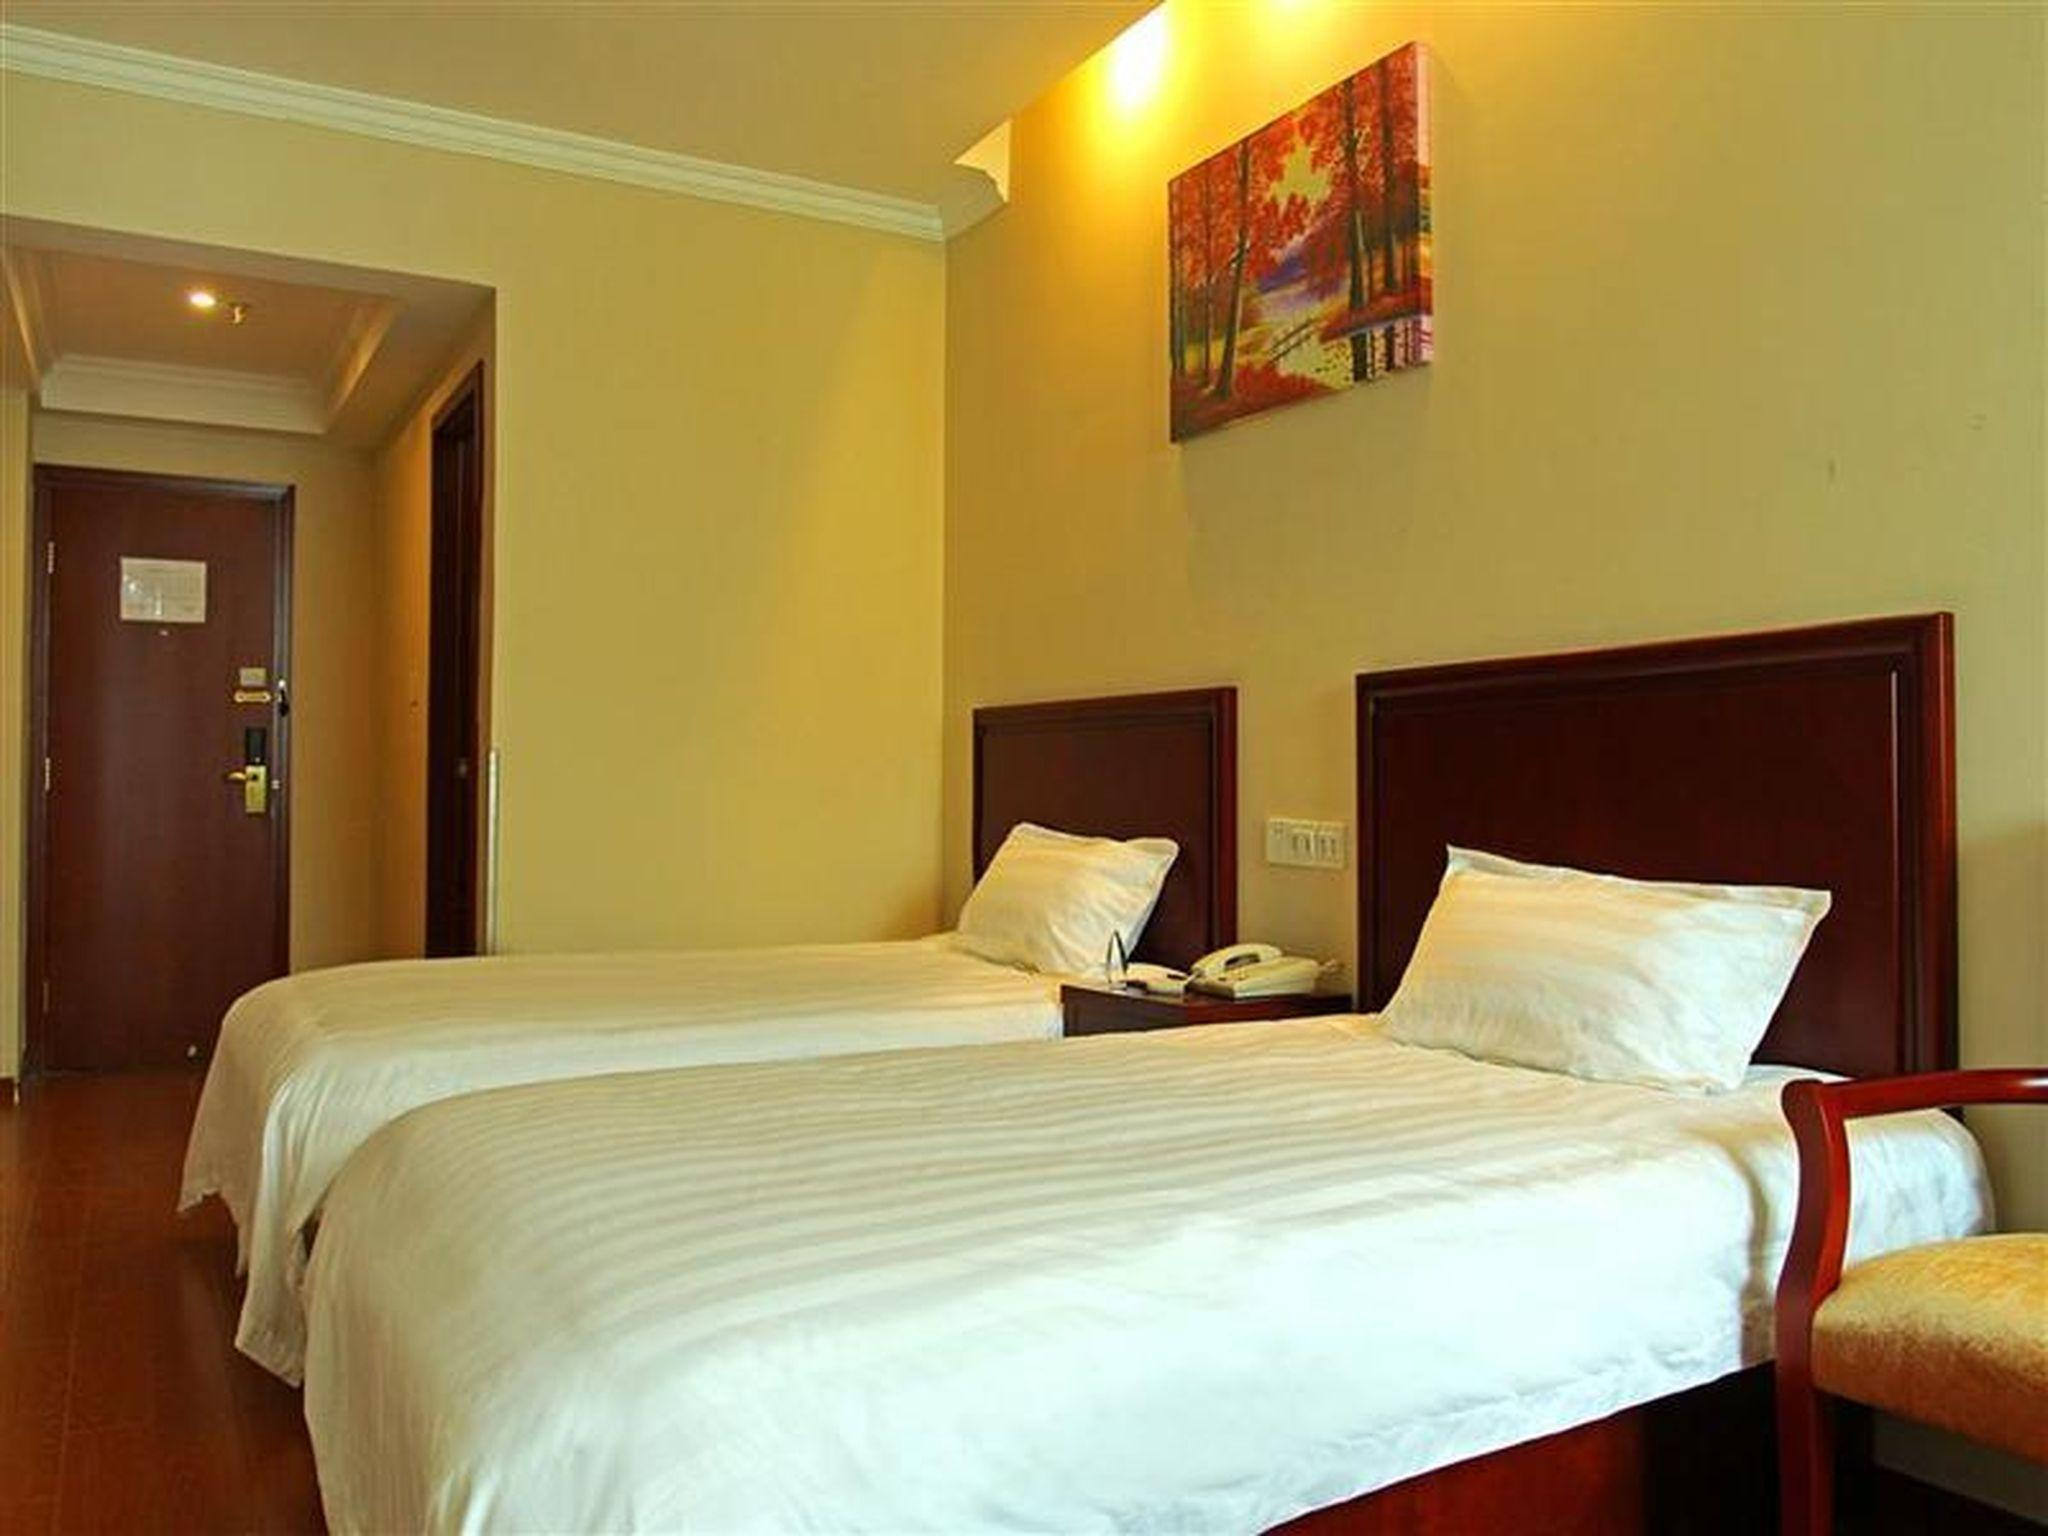 GreenTree Inn Nanjing Dachang Getang Metro Station Express Hotel